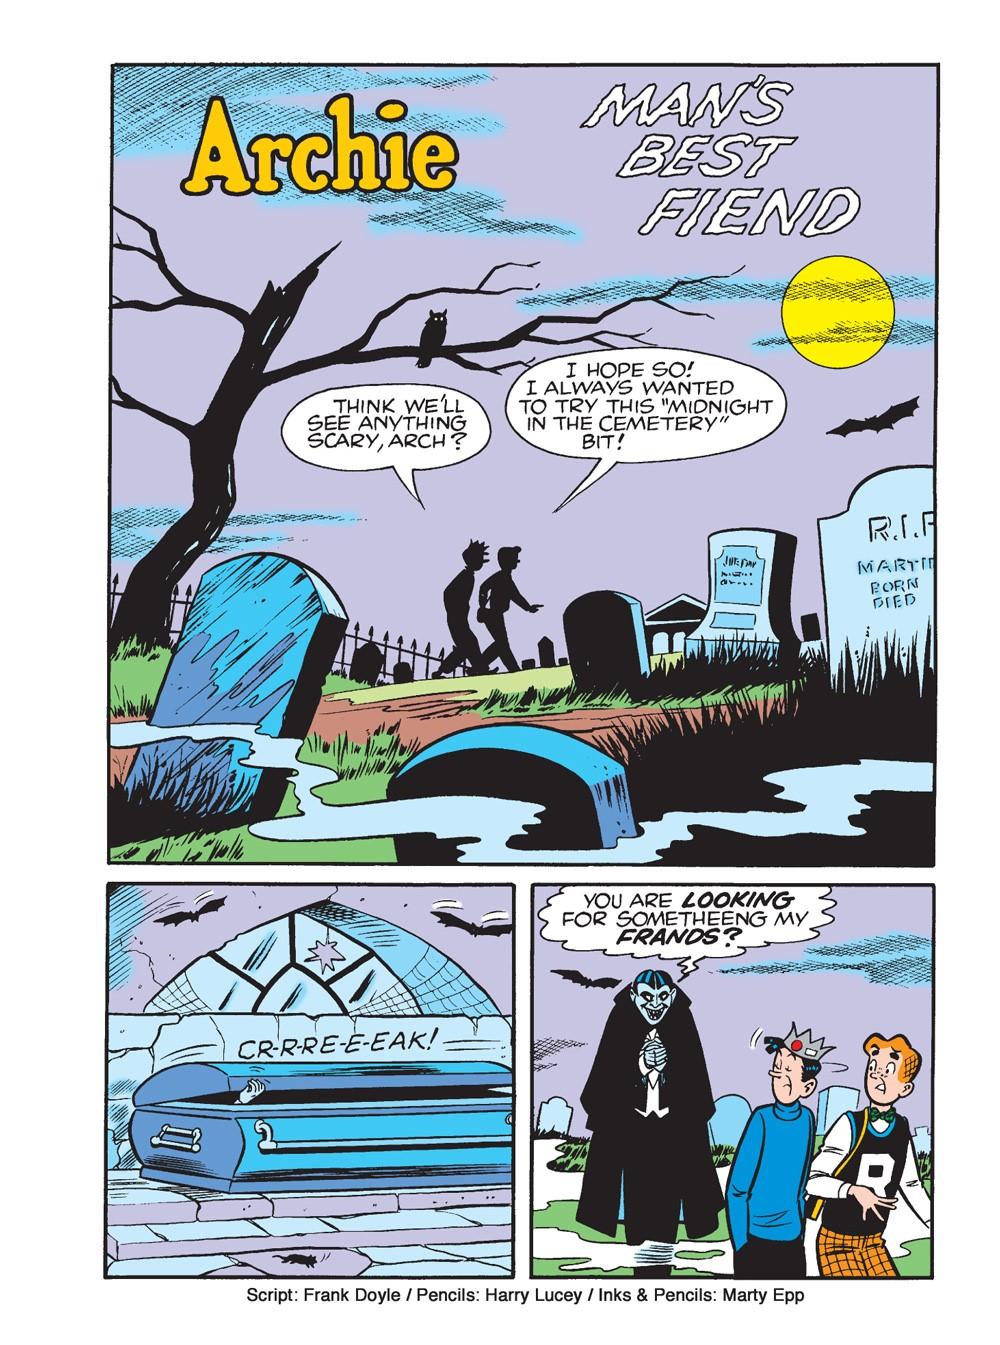 WorldOfArchieJumboComicsDigest_113-62 ComicList Previews: WORLD OF ARCHIE JUMBO COMICS DIGEST #113